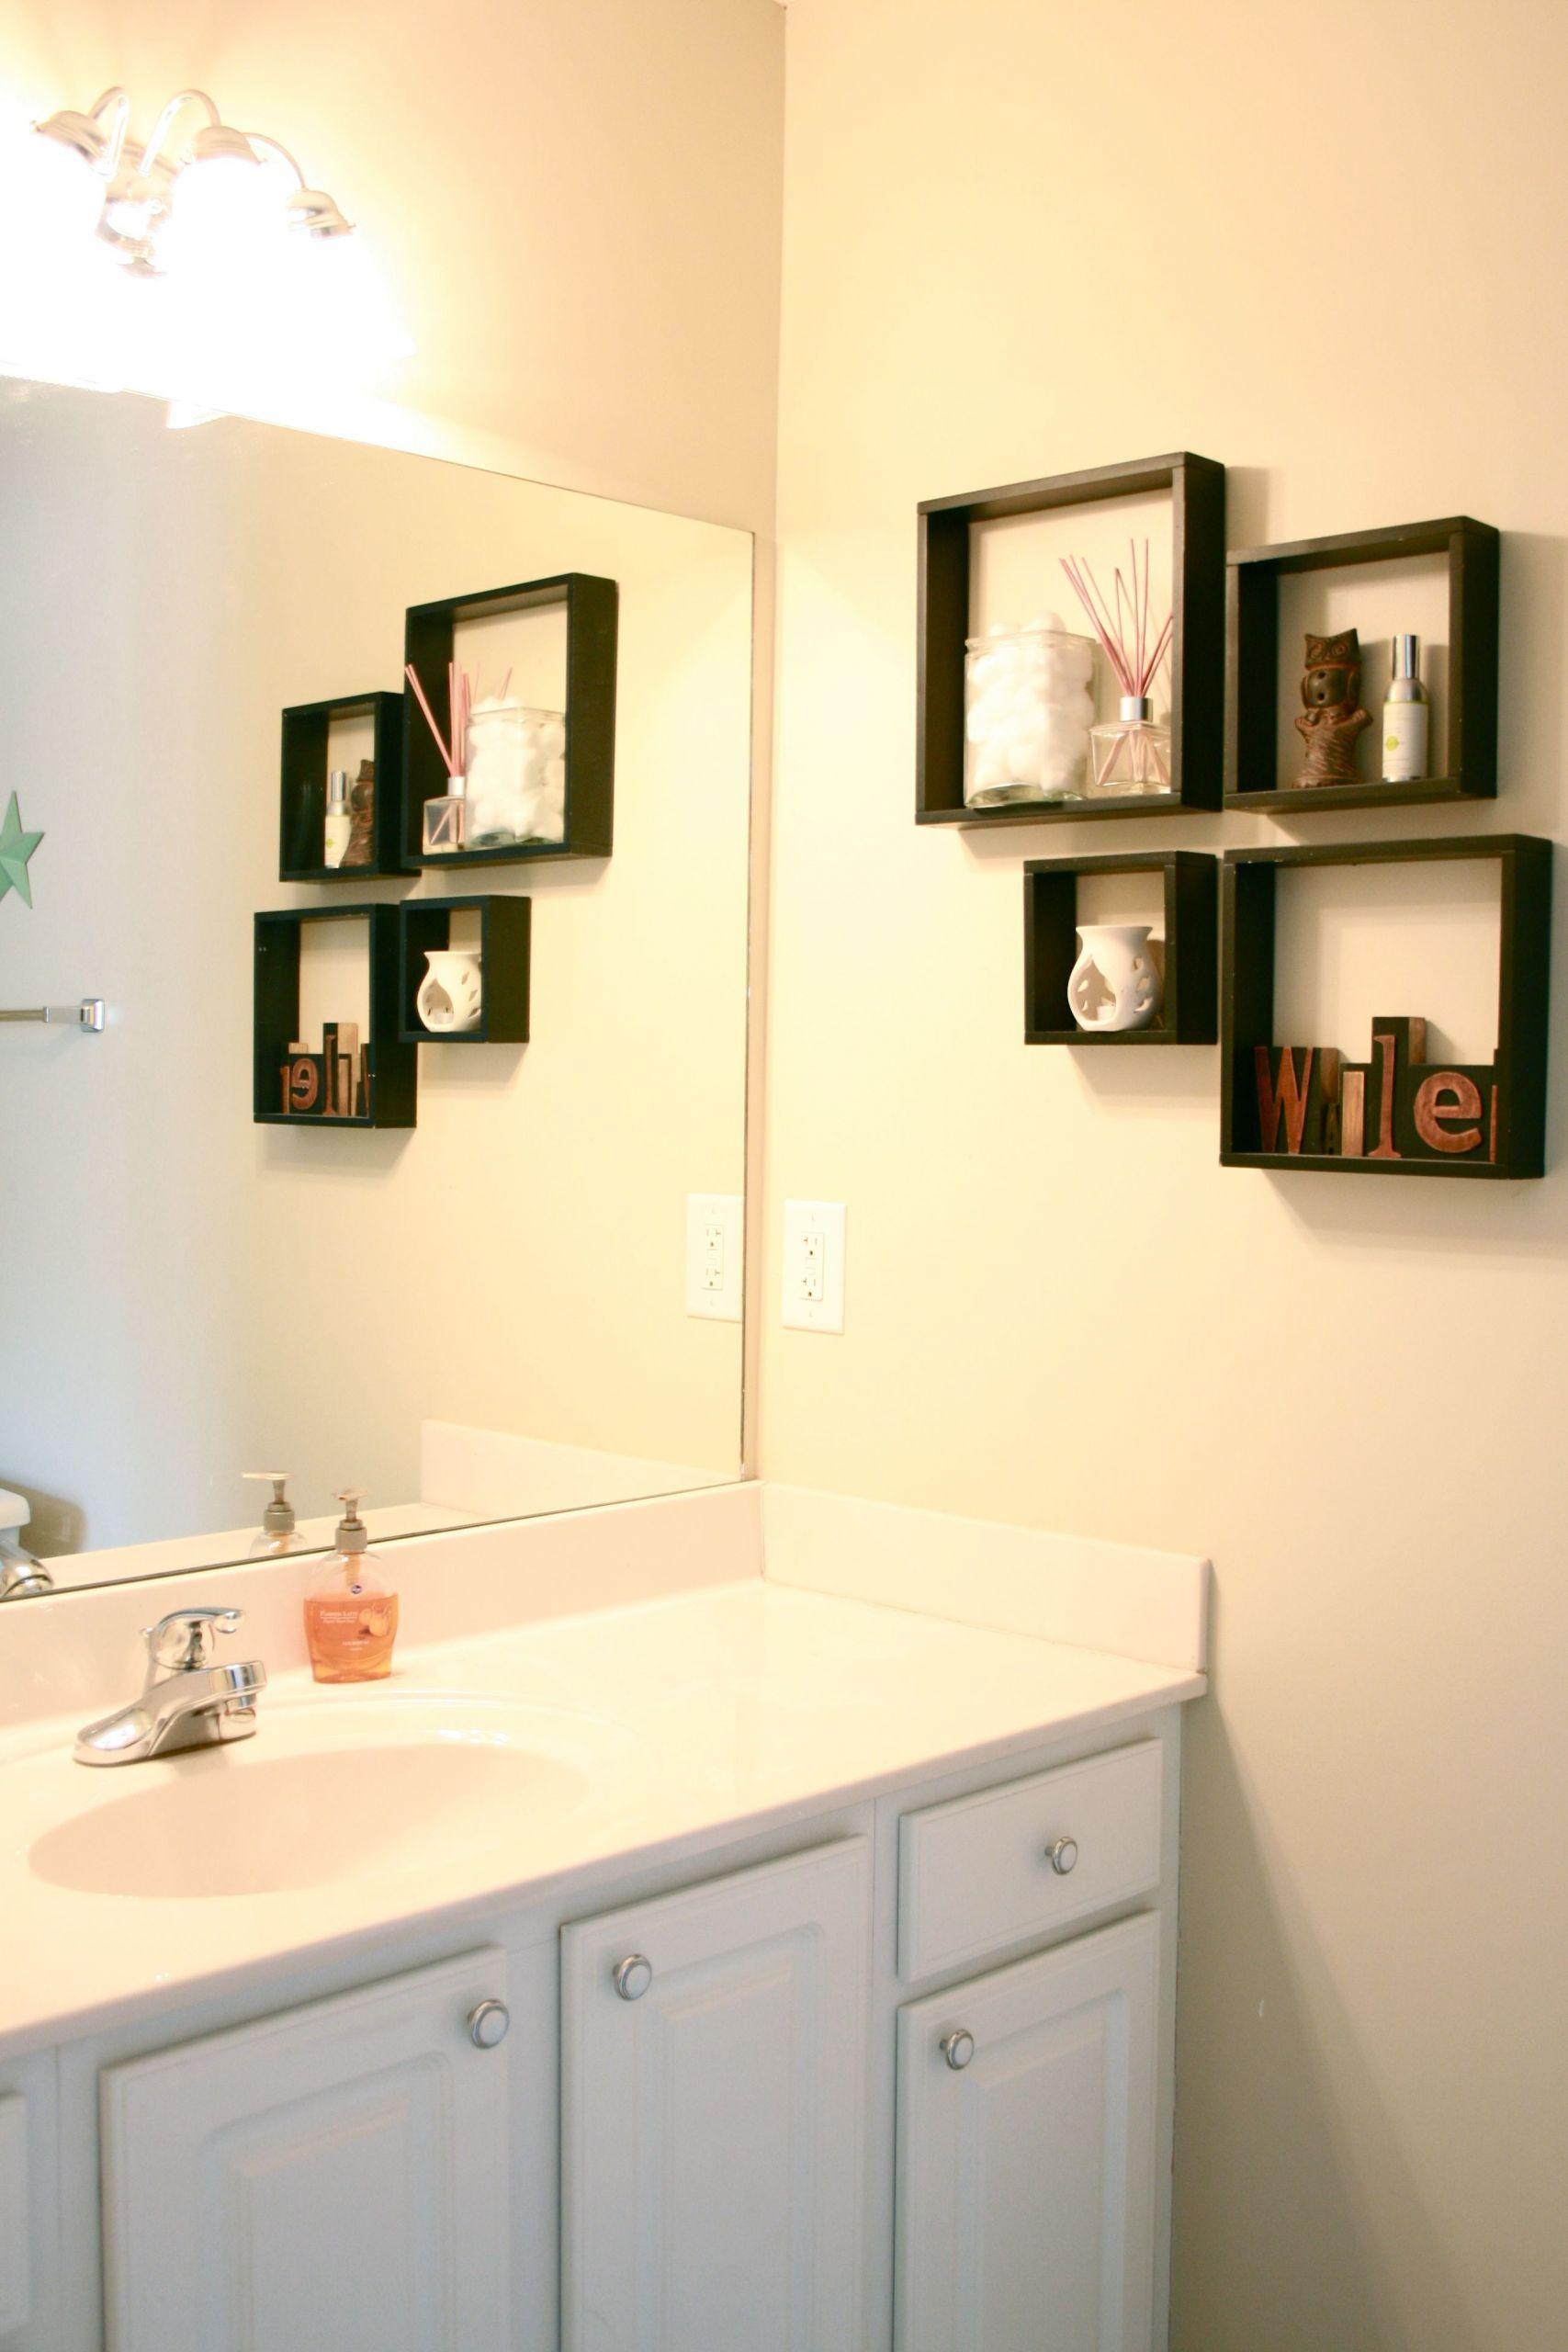 Bathroom Divider Walls  Chic Bathroom Wall Shelving Ideas for Cleaner Bathroom